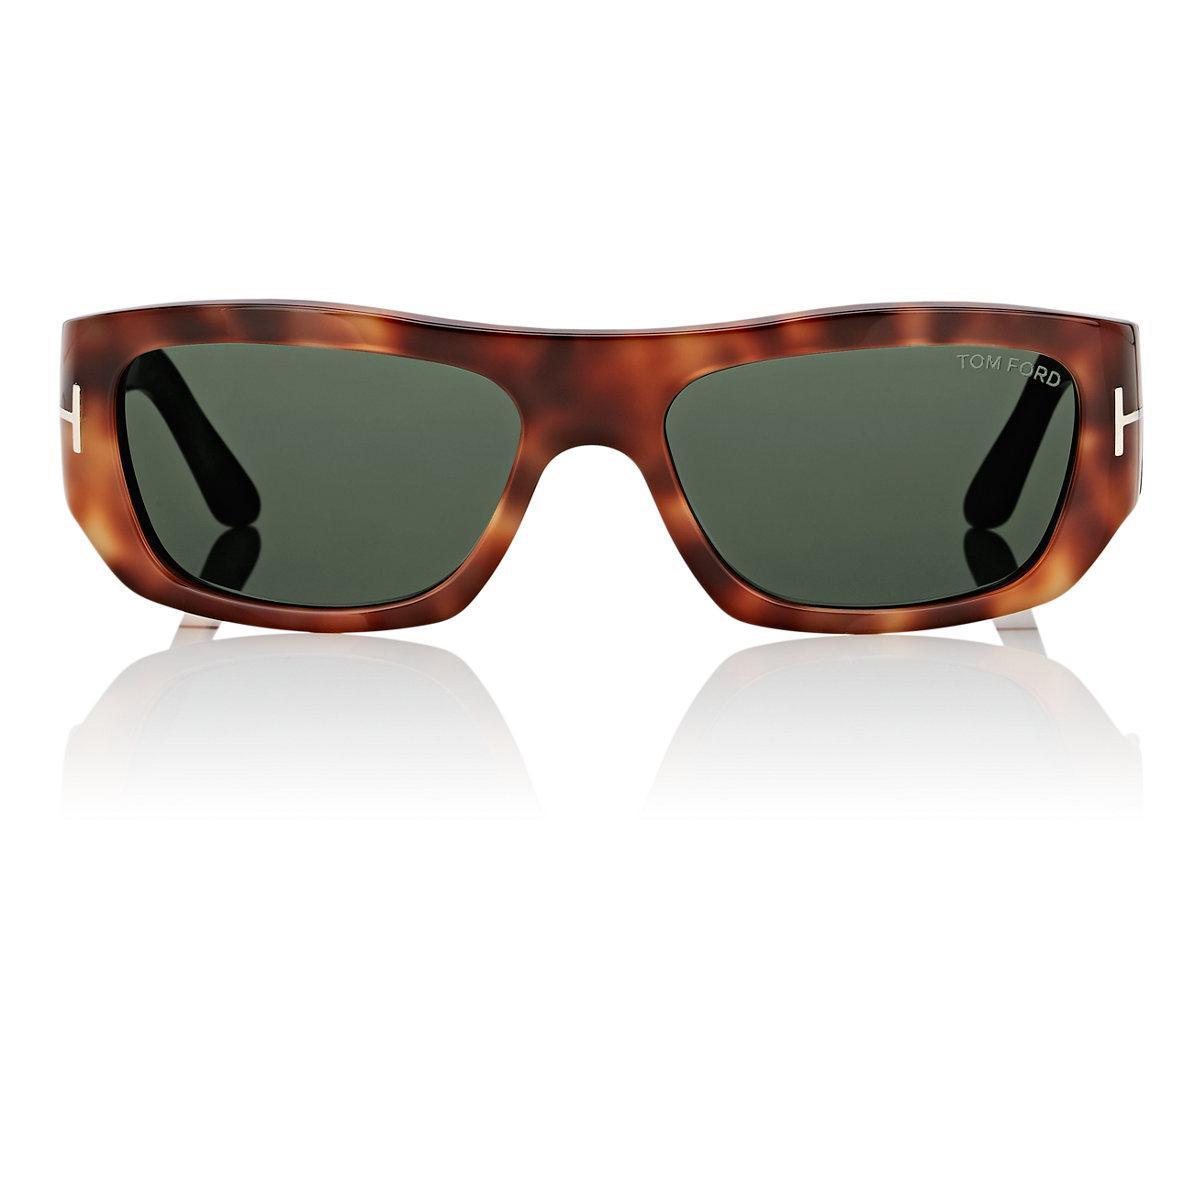 d9f027e85e952 Tom Ford Rodrigo Sunglasses in Brown for Men - Lyst